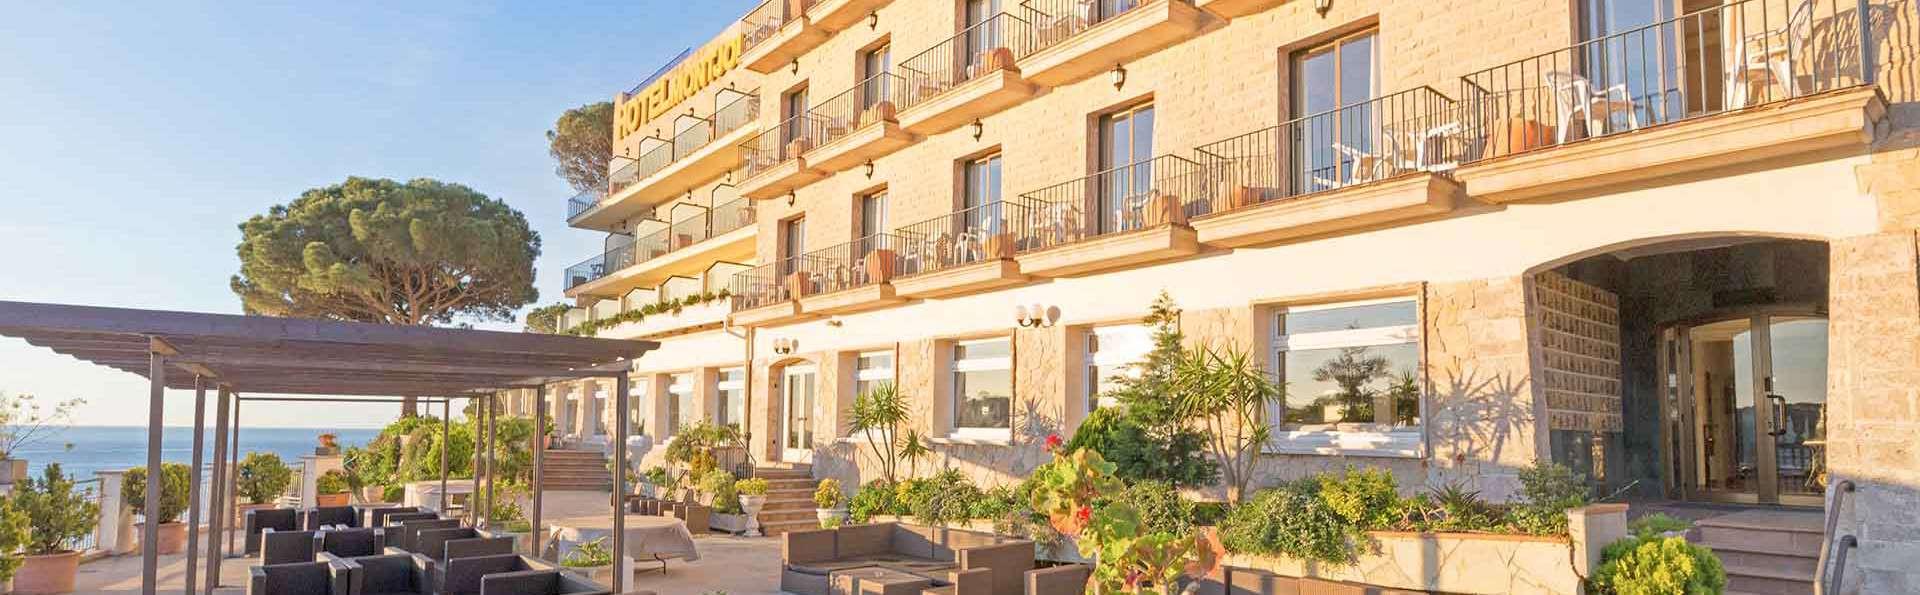 Hotel Montjoi - EDIT_LOUNGE_03.jpg